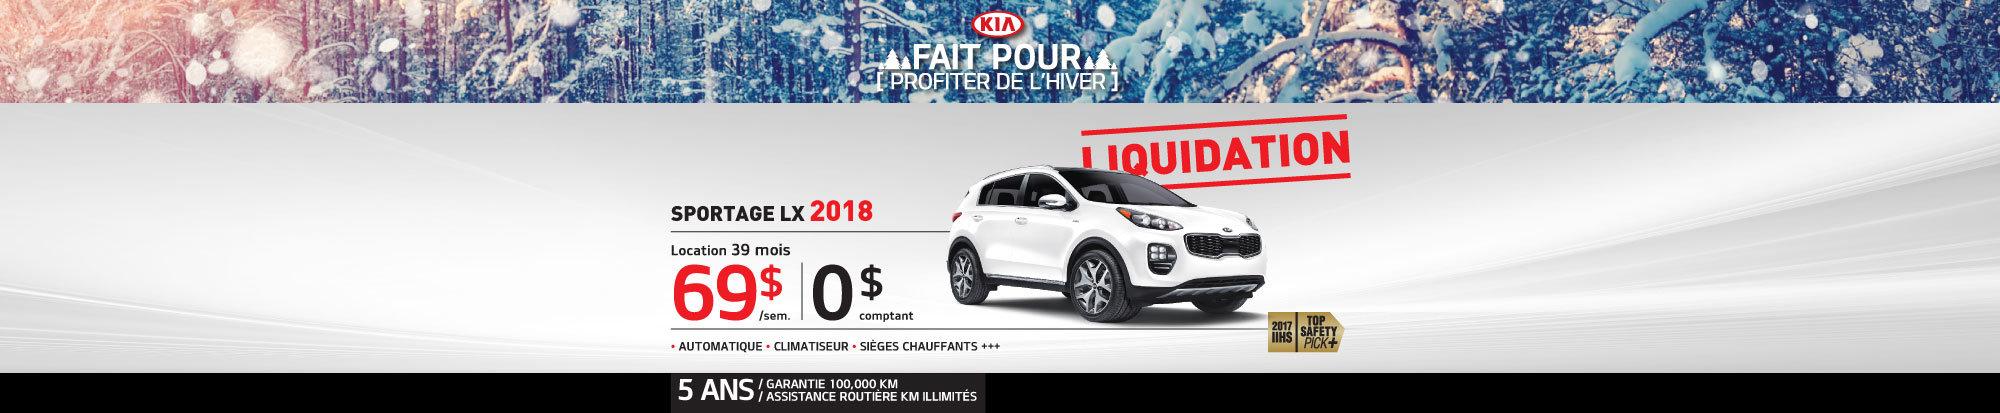 Liquidation Sportage 2018 web